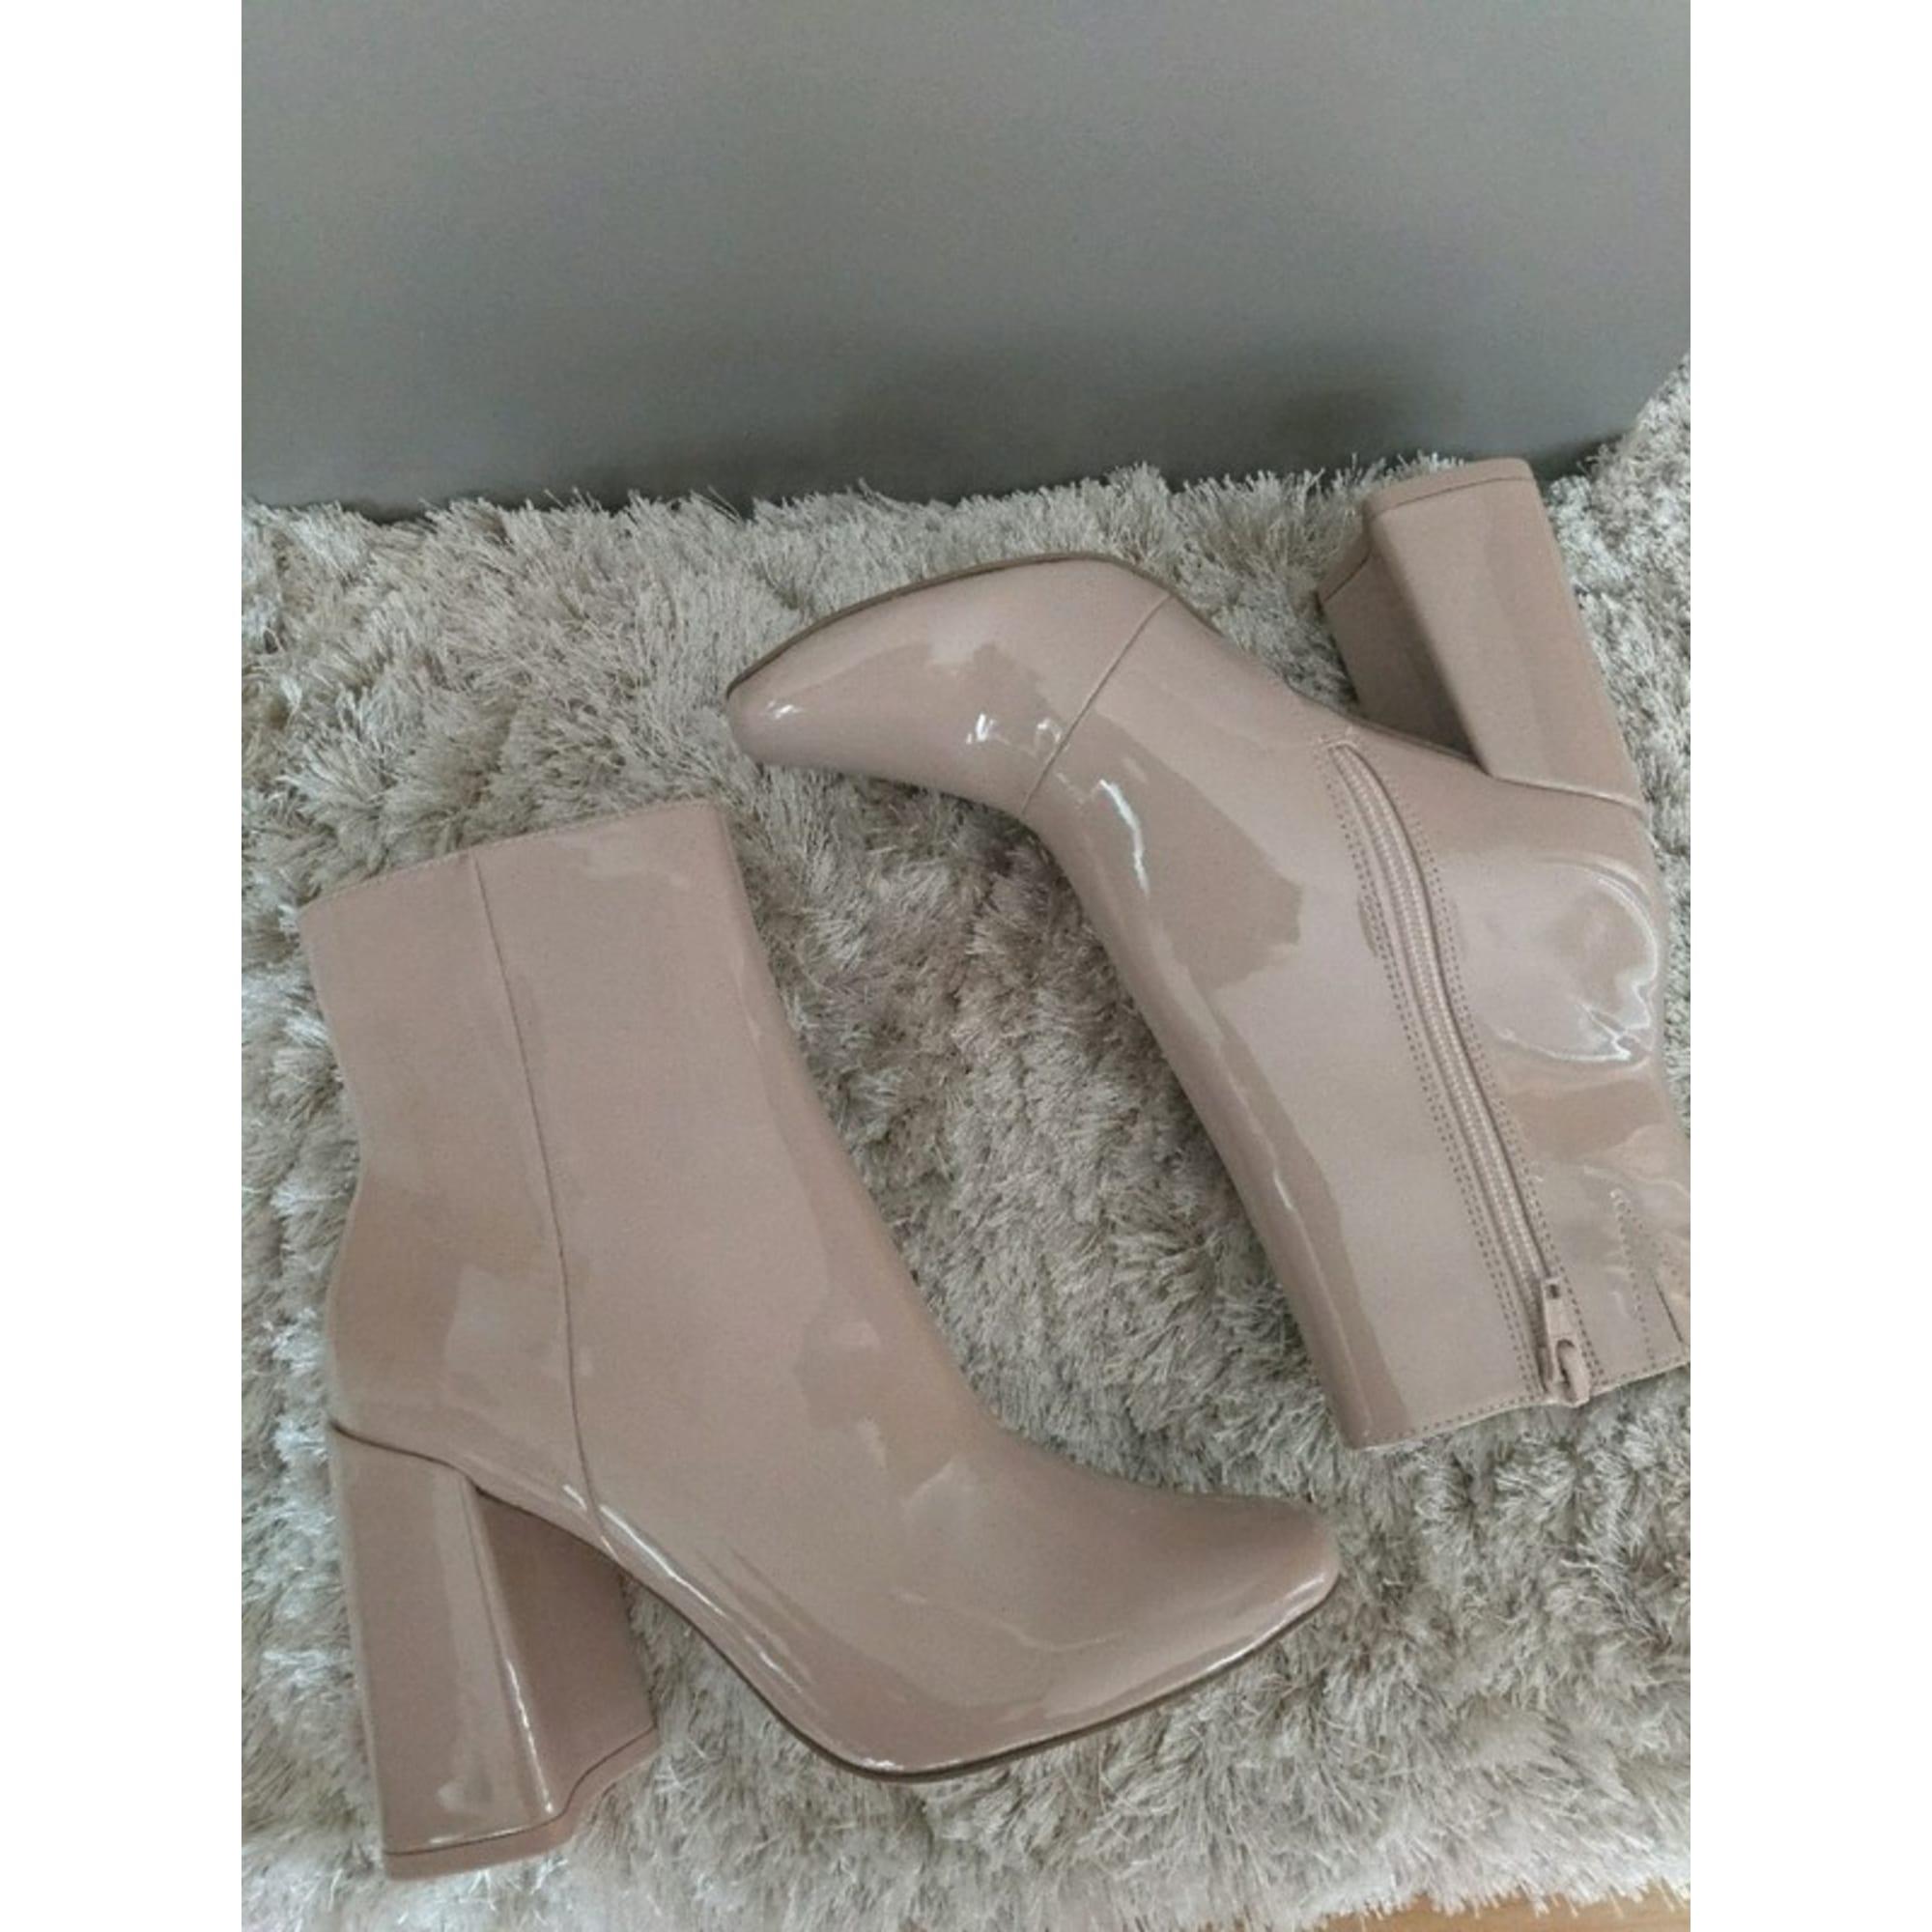 Bottines & low boots à talons ASOS 36 nude 7647592